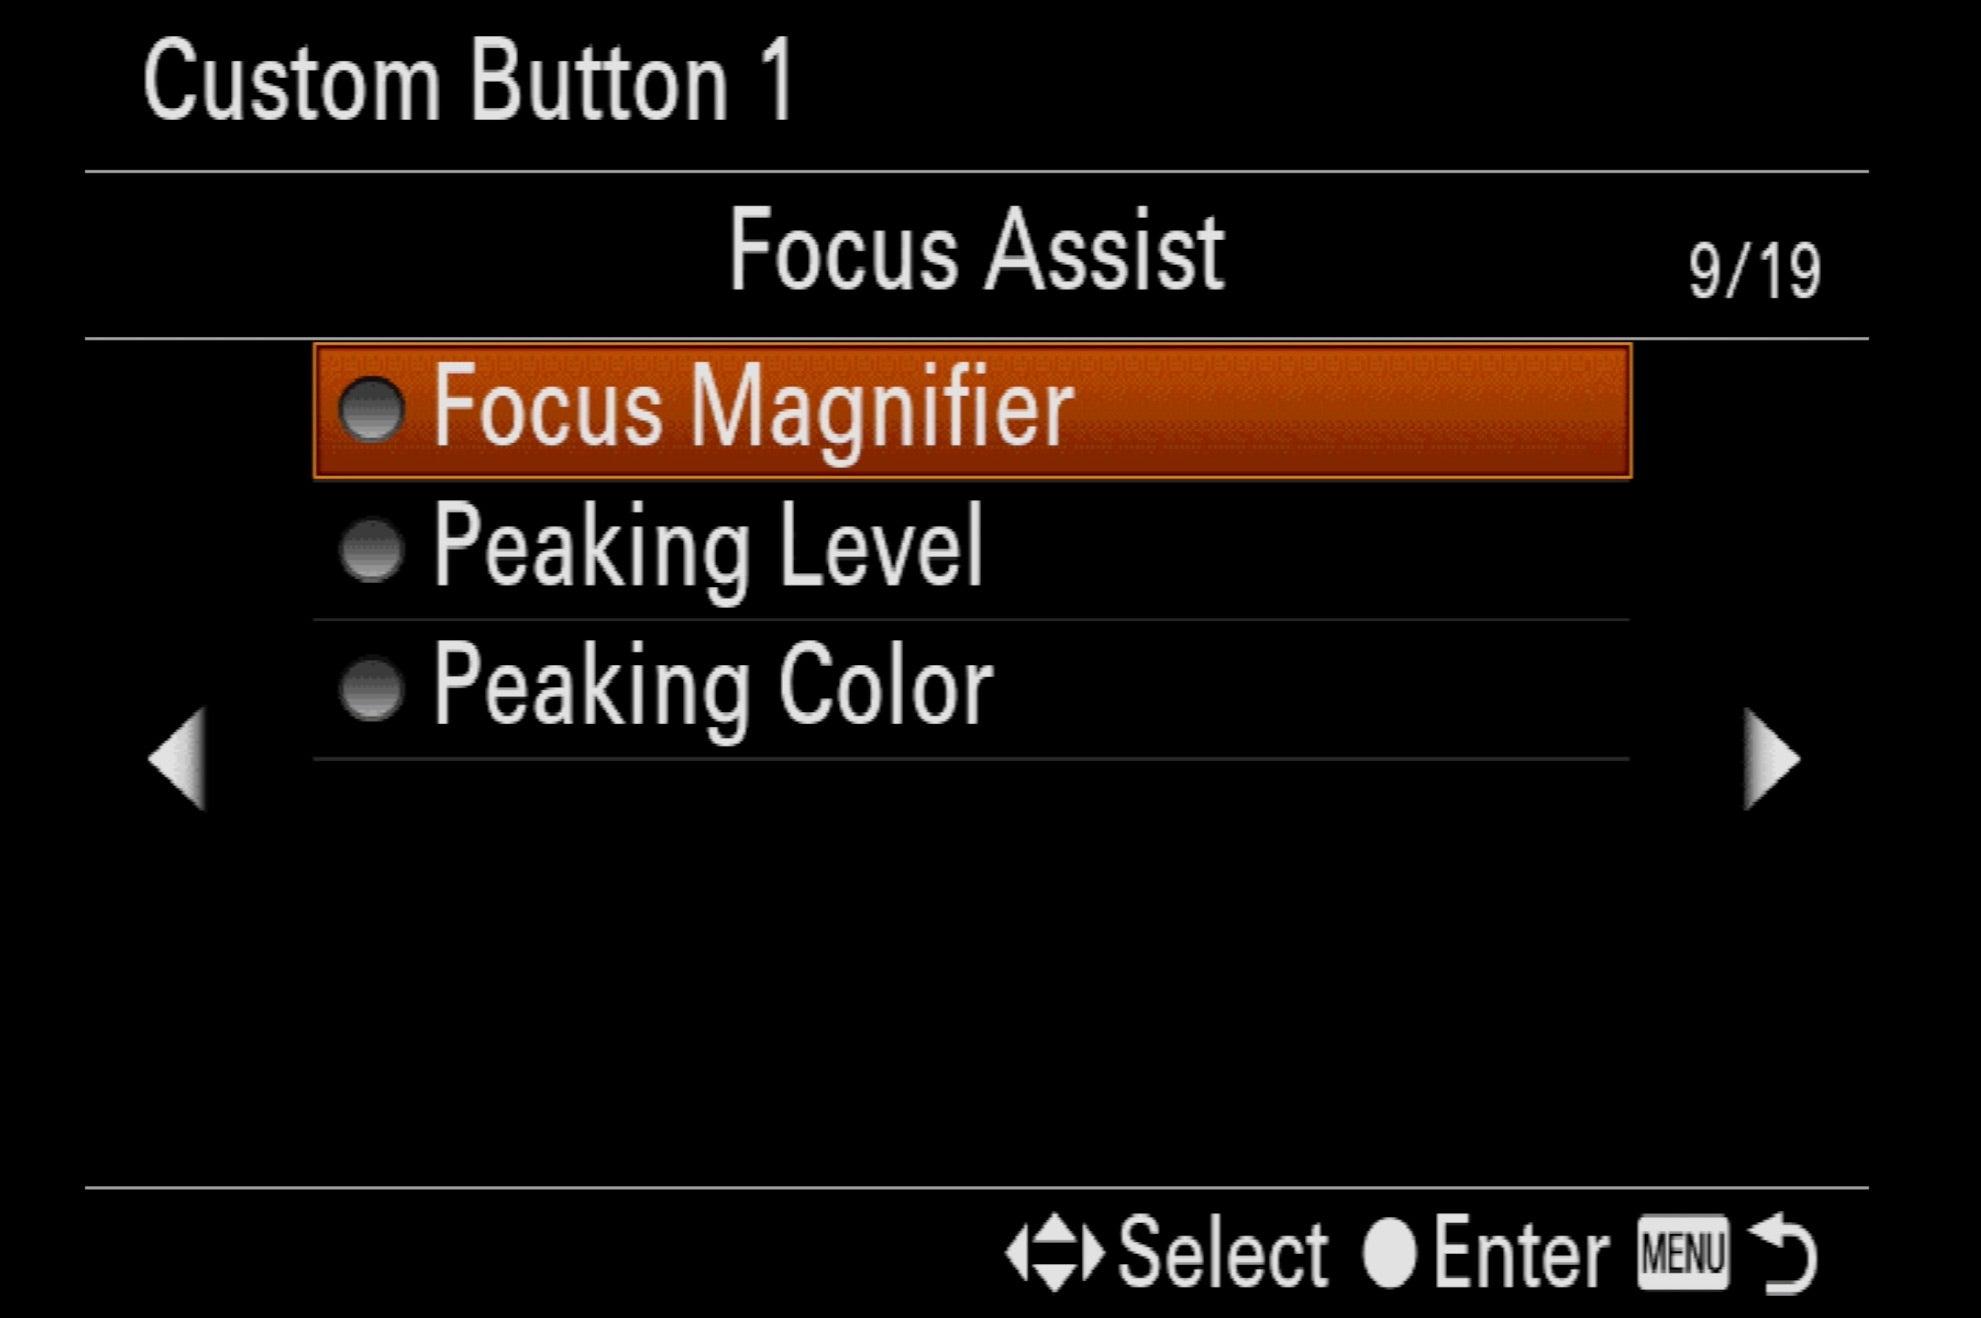 Alpha-Universe-Macro-Camera-Setup-Focus-Magnifier-Mapped3.jpeg